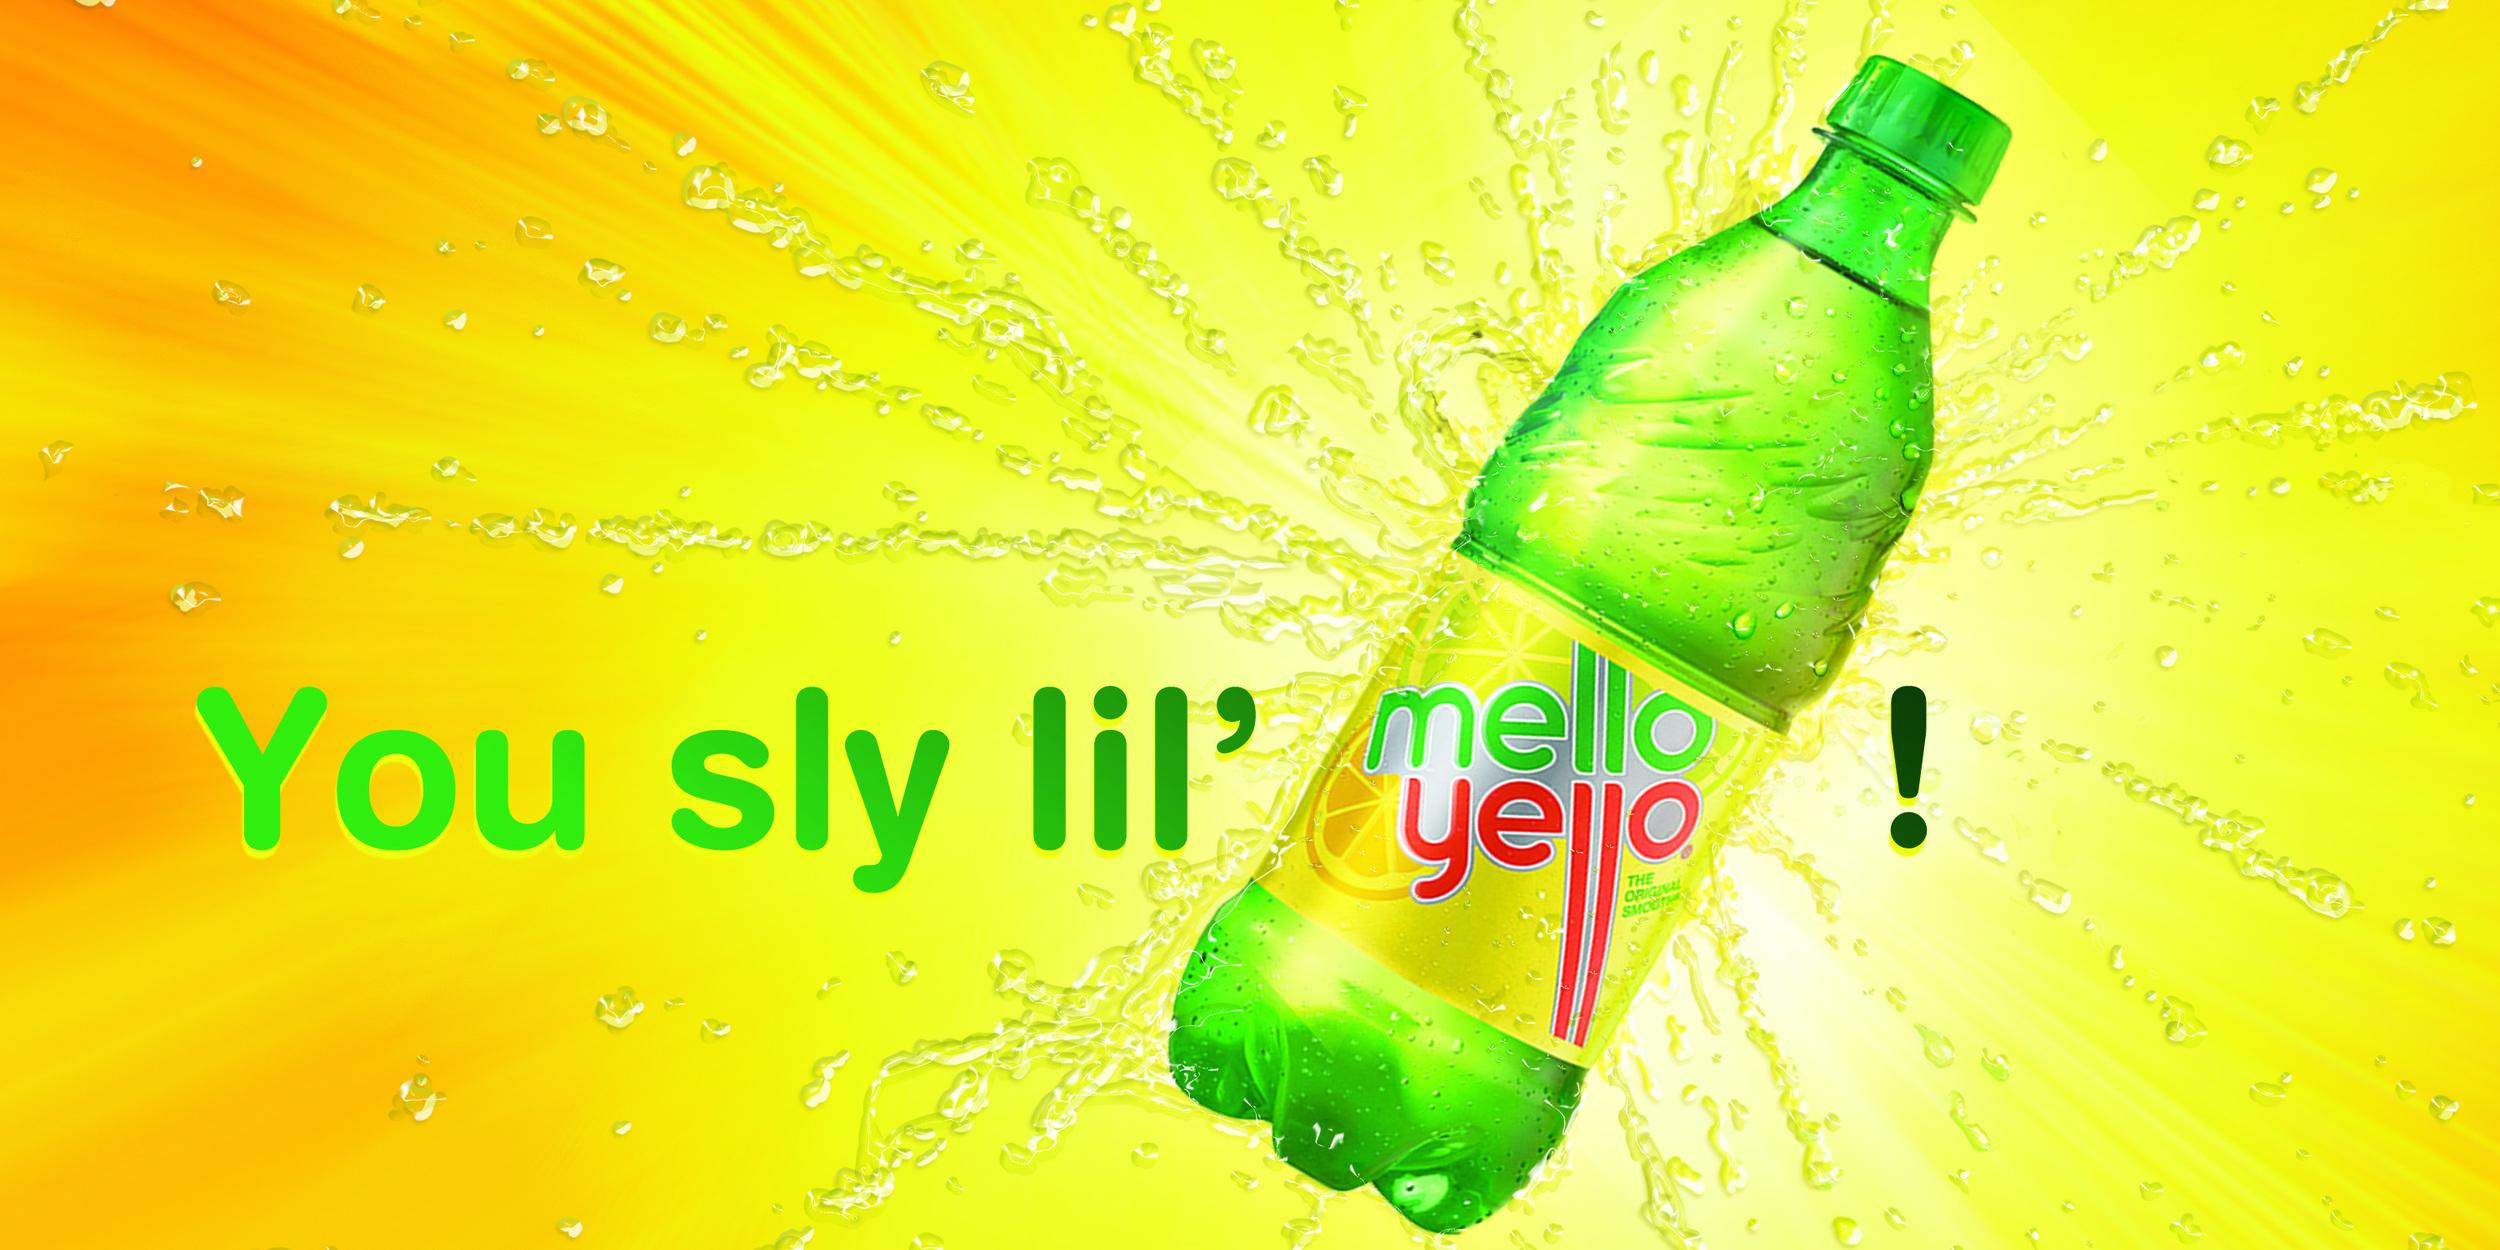 MelloYelloEnergy_B_Sly.jpg